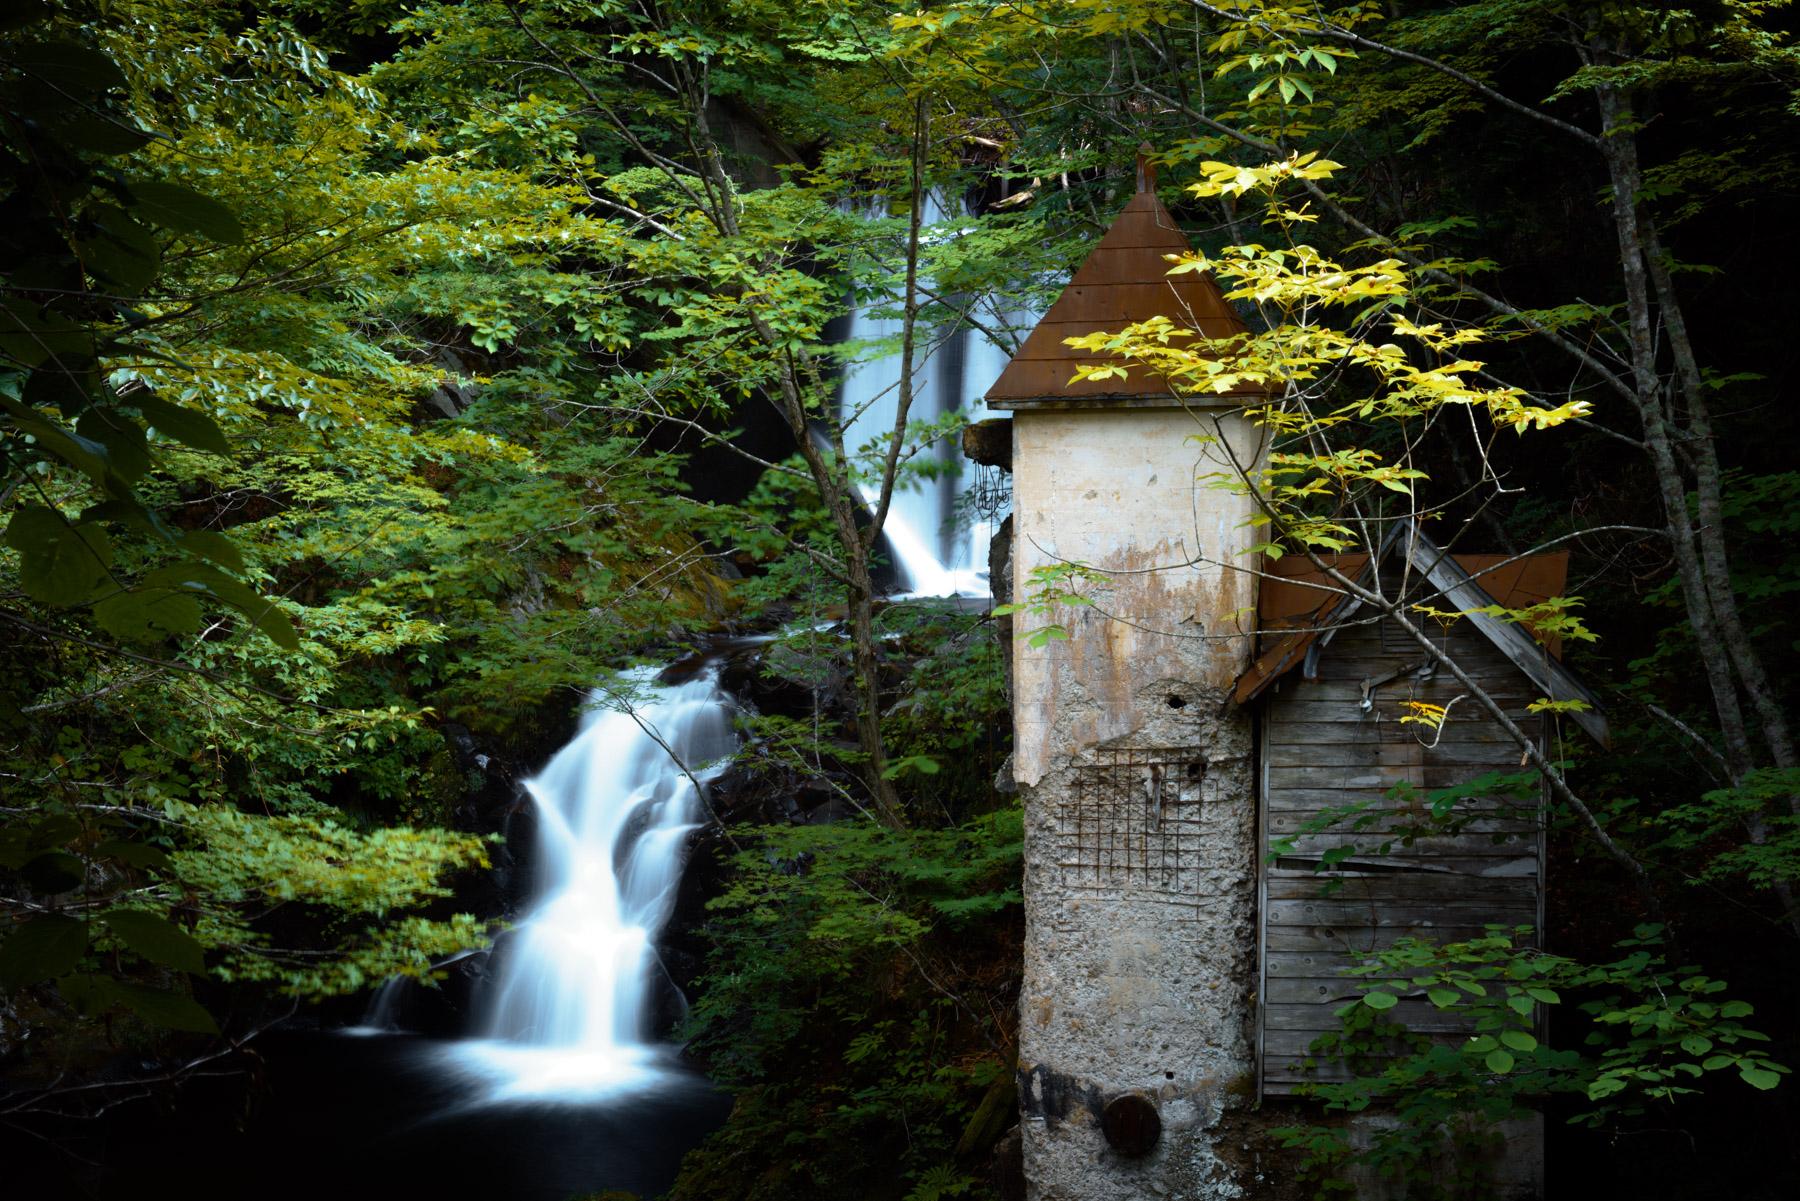 abandoned, aomori, asia, factory, haikyo, japan, japanese, natural, nature, ruin, tohoku, urban exploration, urbex, waterfall